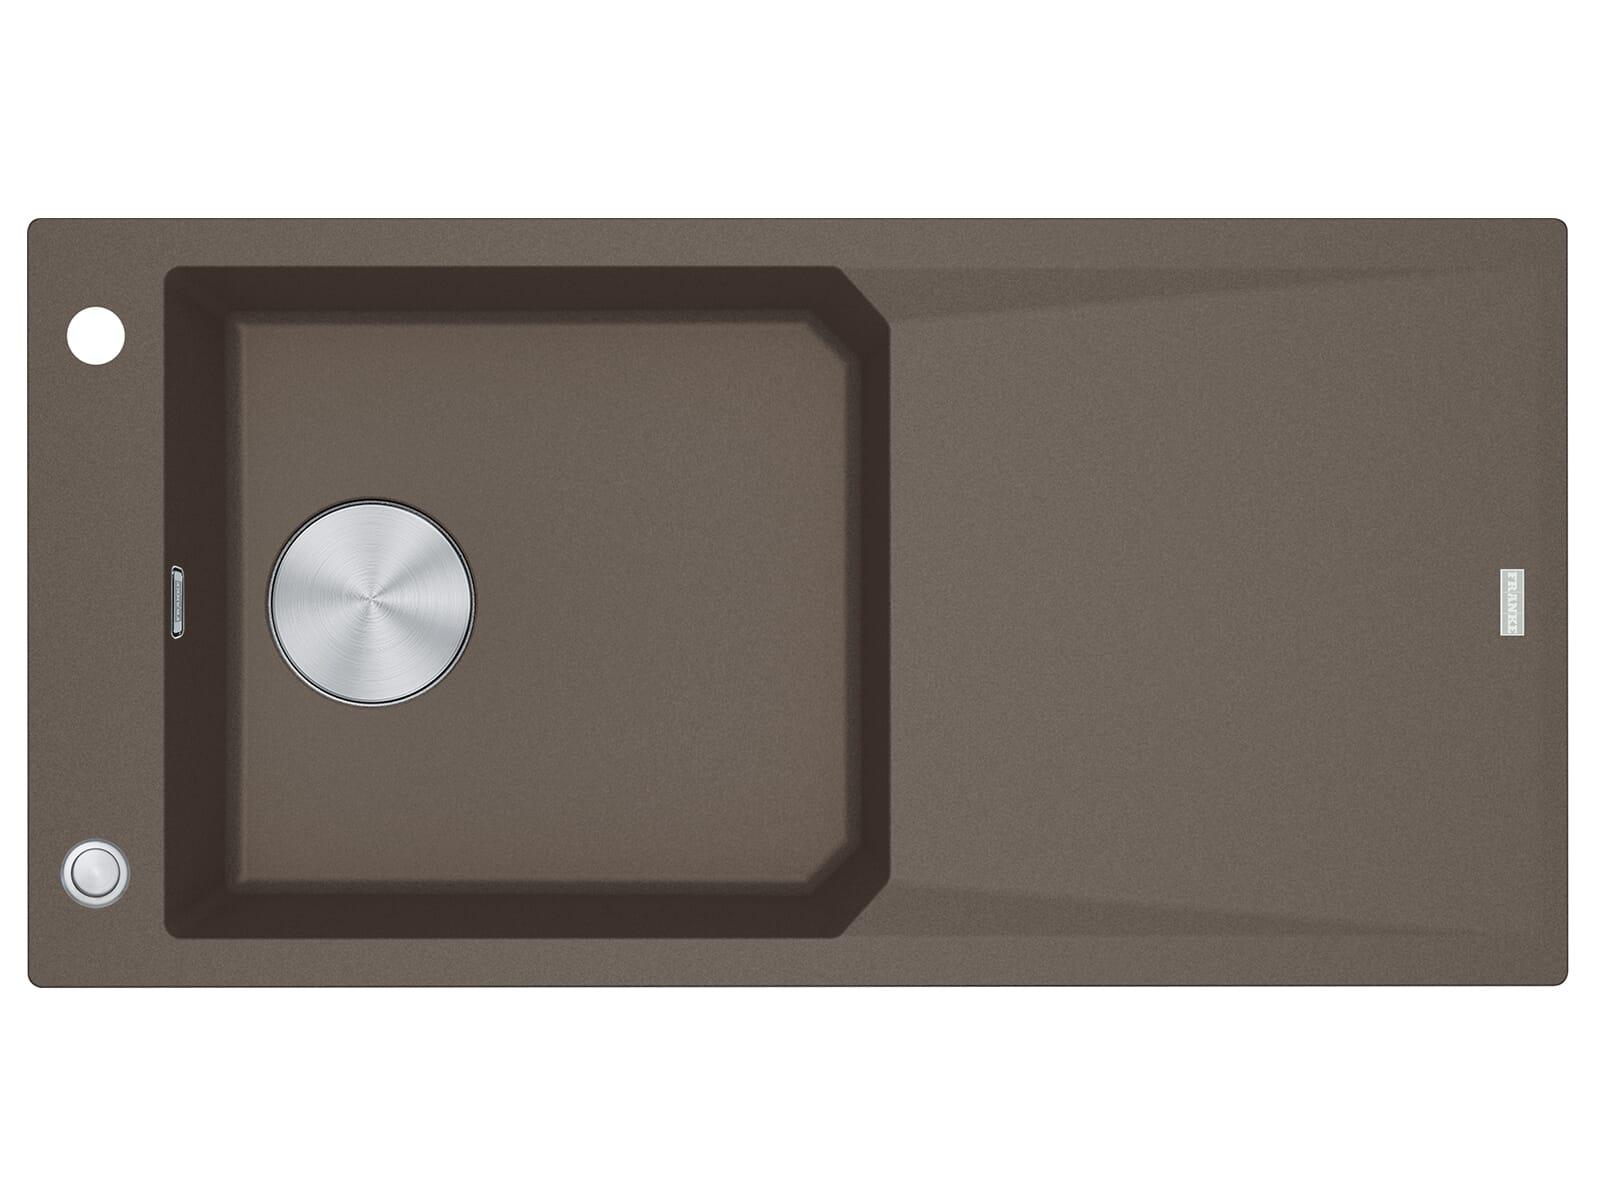 Franke FXG 611-100 Umbra - 114.0512.364 Granitspüle Exzenterbetätigung